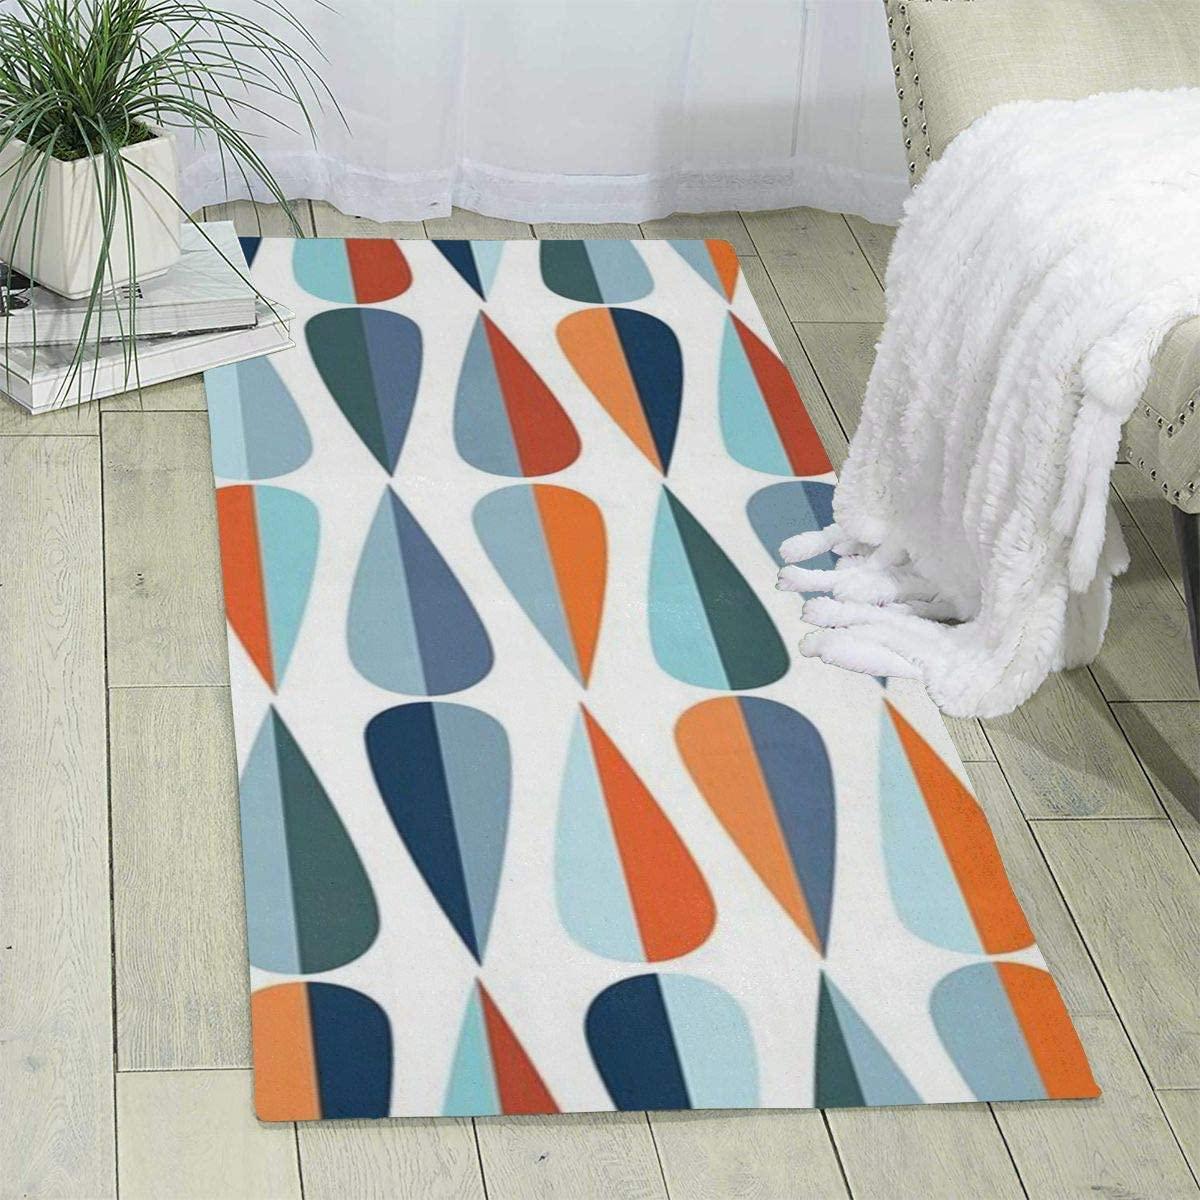 Mid Century Modern Retro with Drop Shapes Printed Area Rug Hallway Runner Rug Living Room Rugs Carpet Entry Rugs Room Bedroom Rug,70'' X 24''